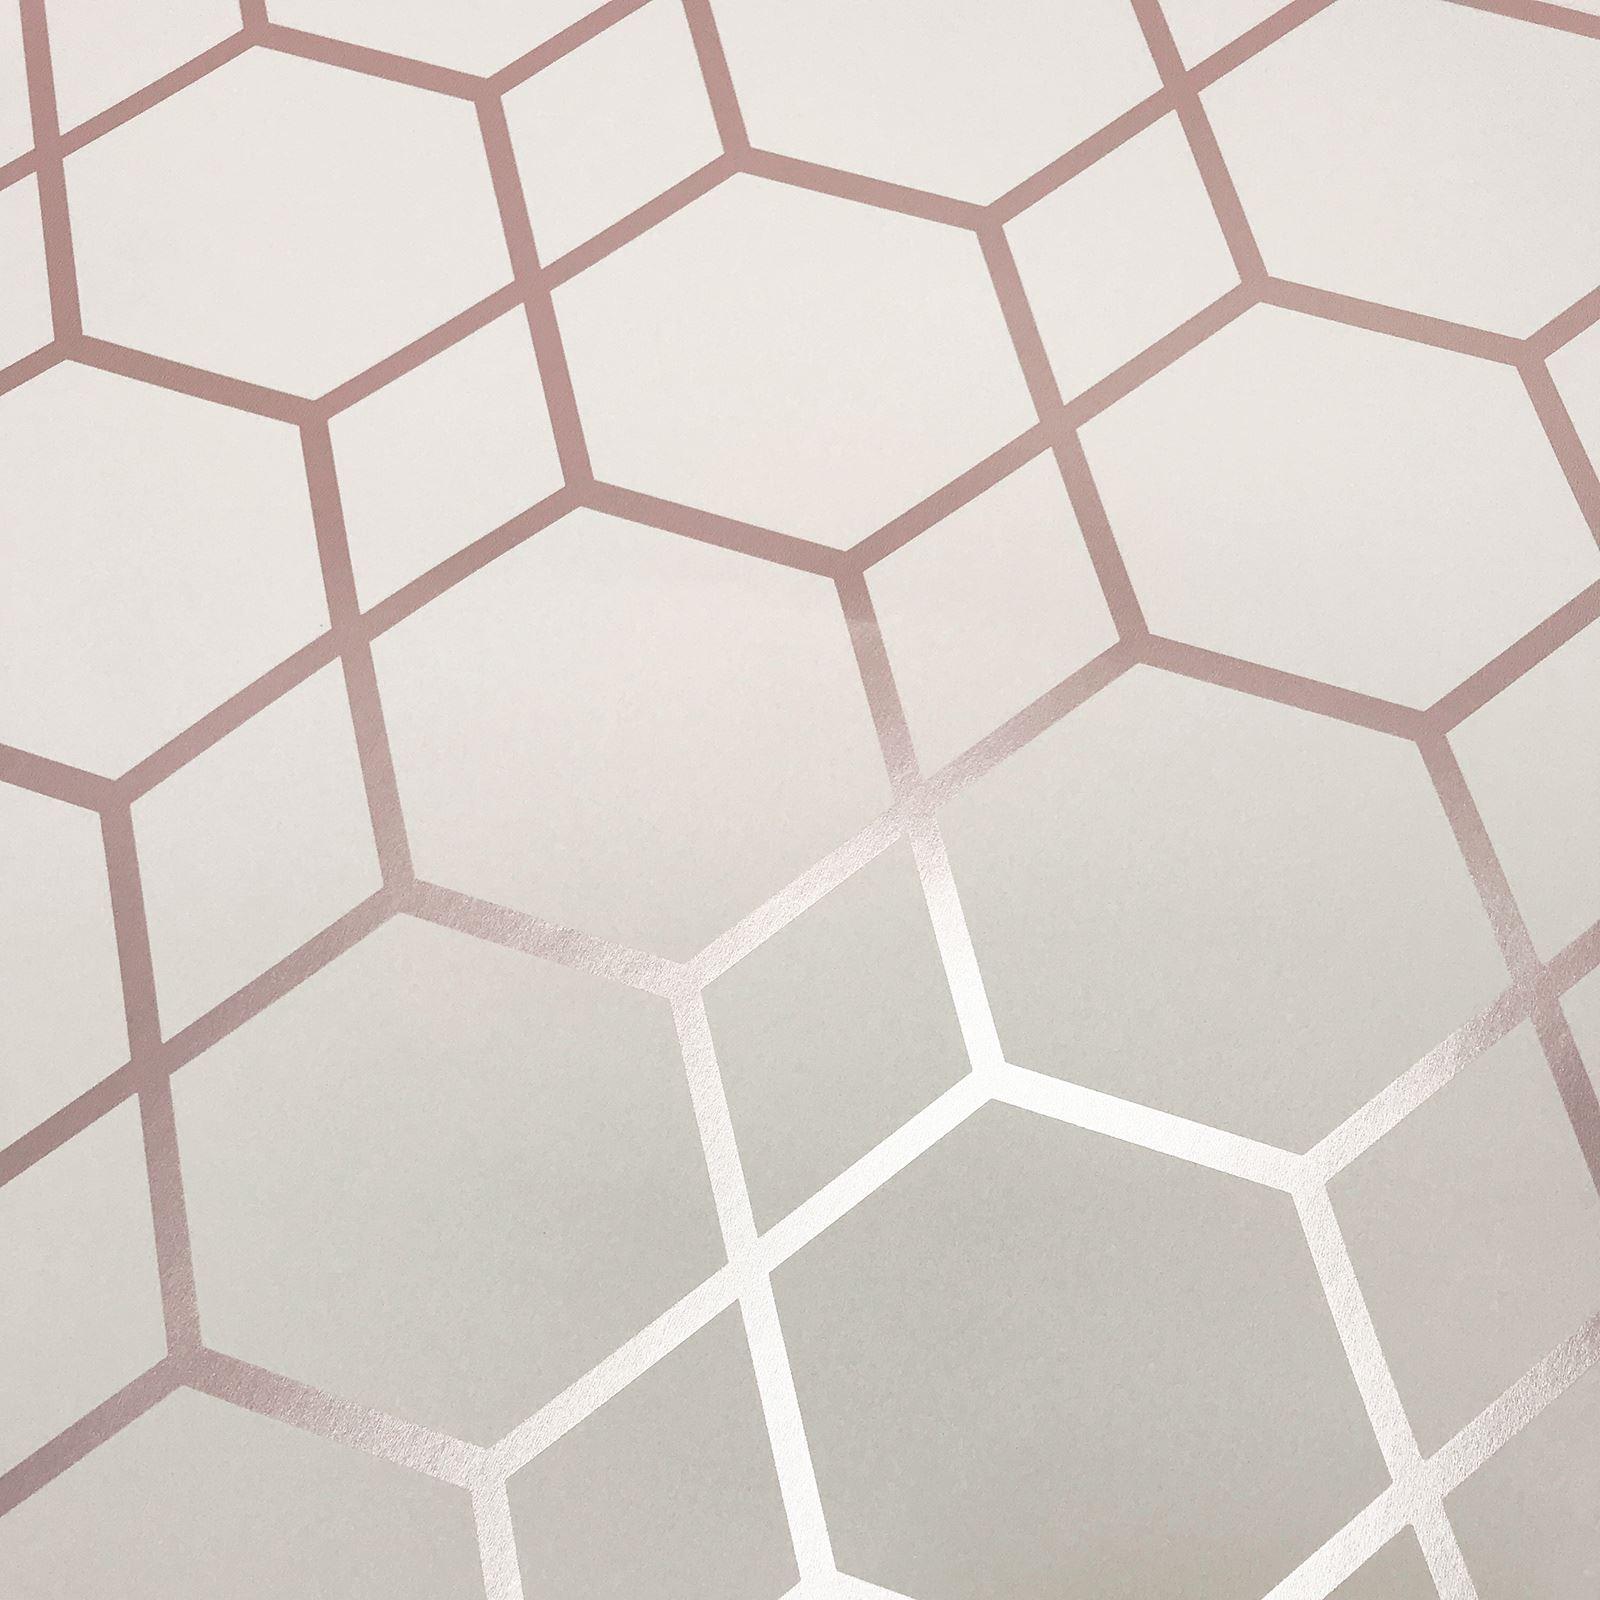 Muriva Casca Pink Wallpaper 152504 Feature Chic Metallic Geometric Triangles